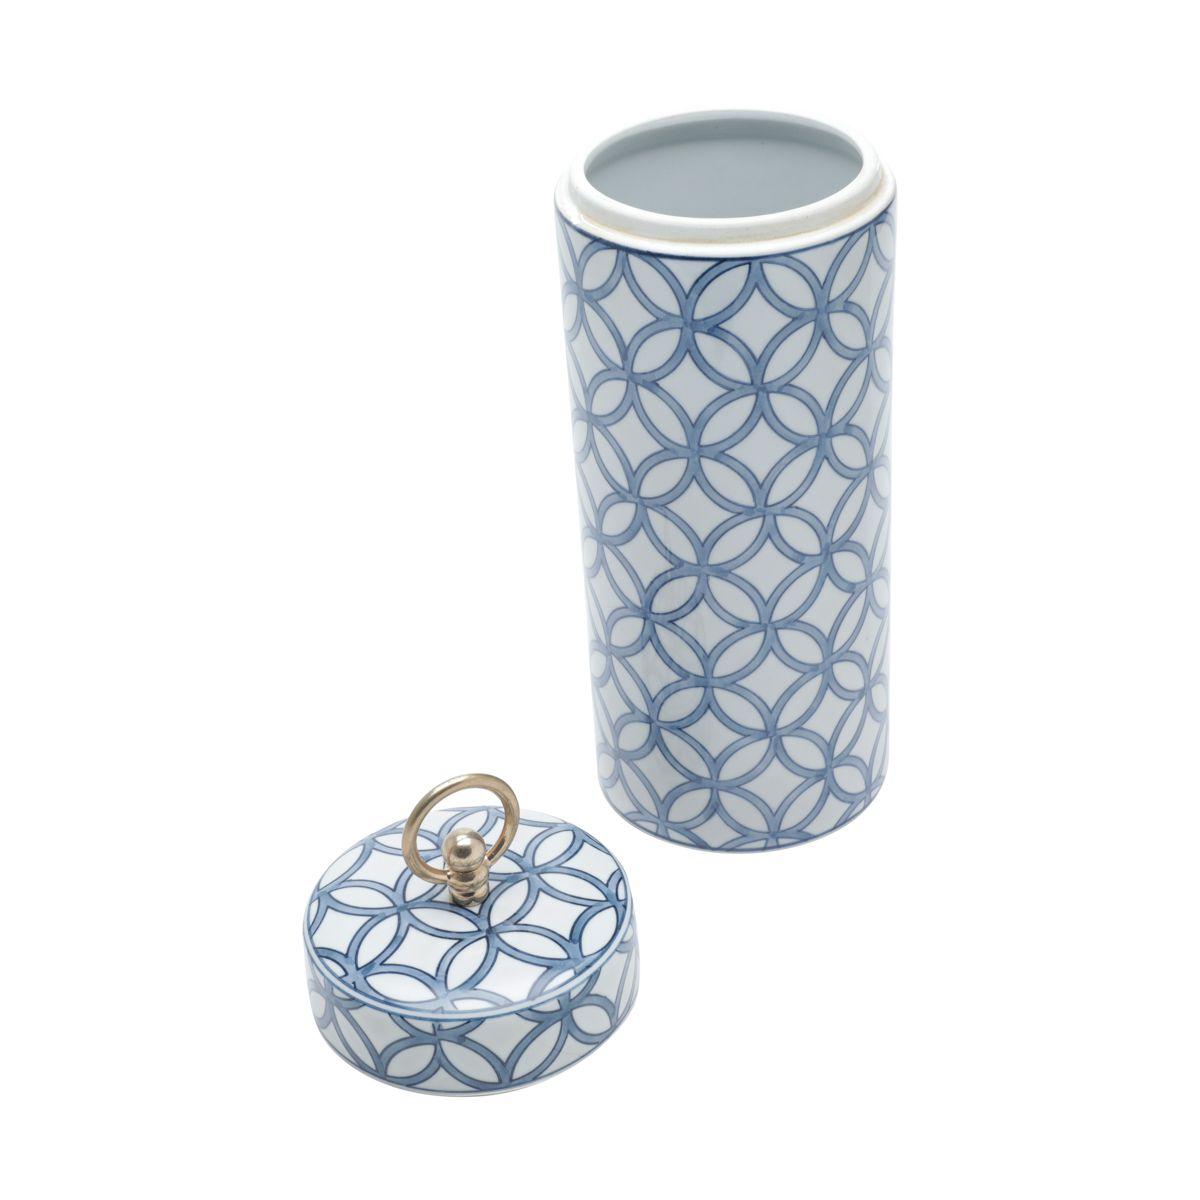 Potiche Decorativo Porcelana Branco/Azul 14x40cm